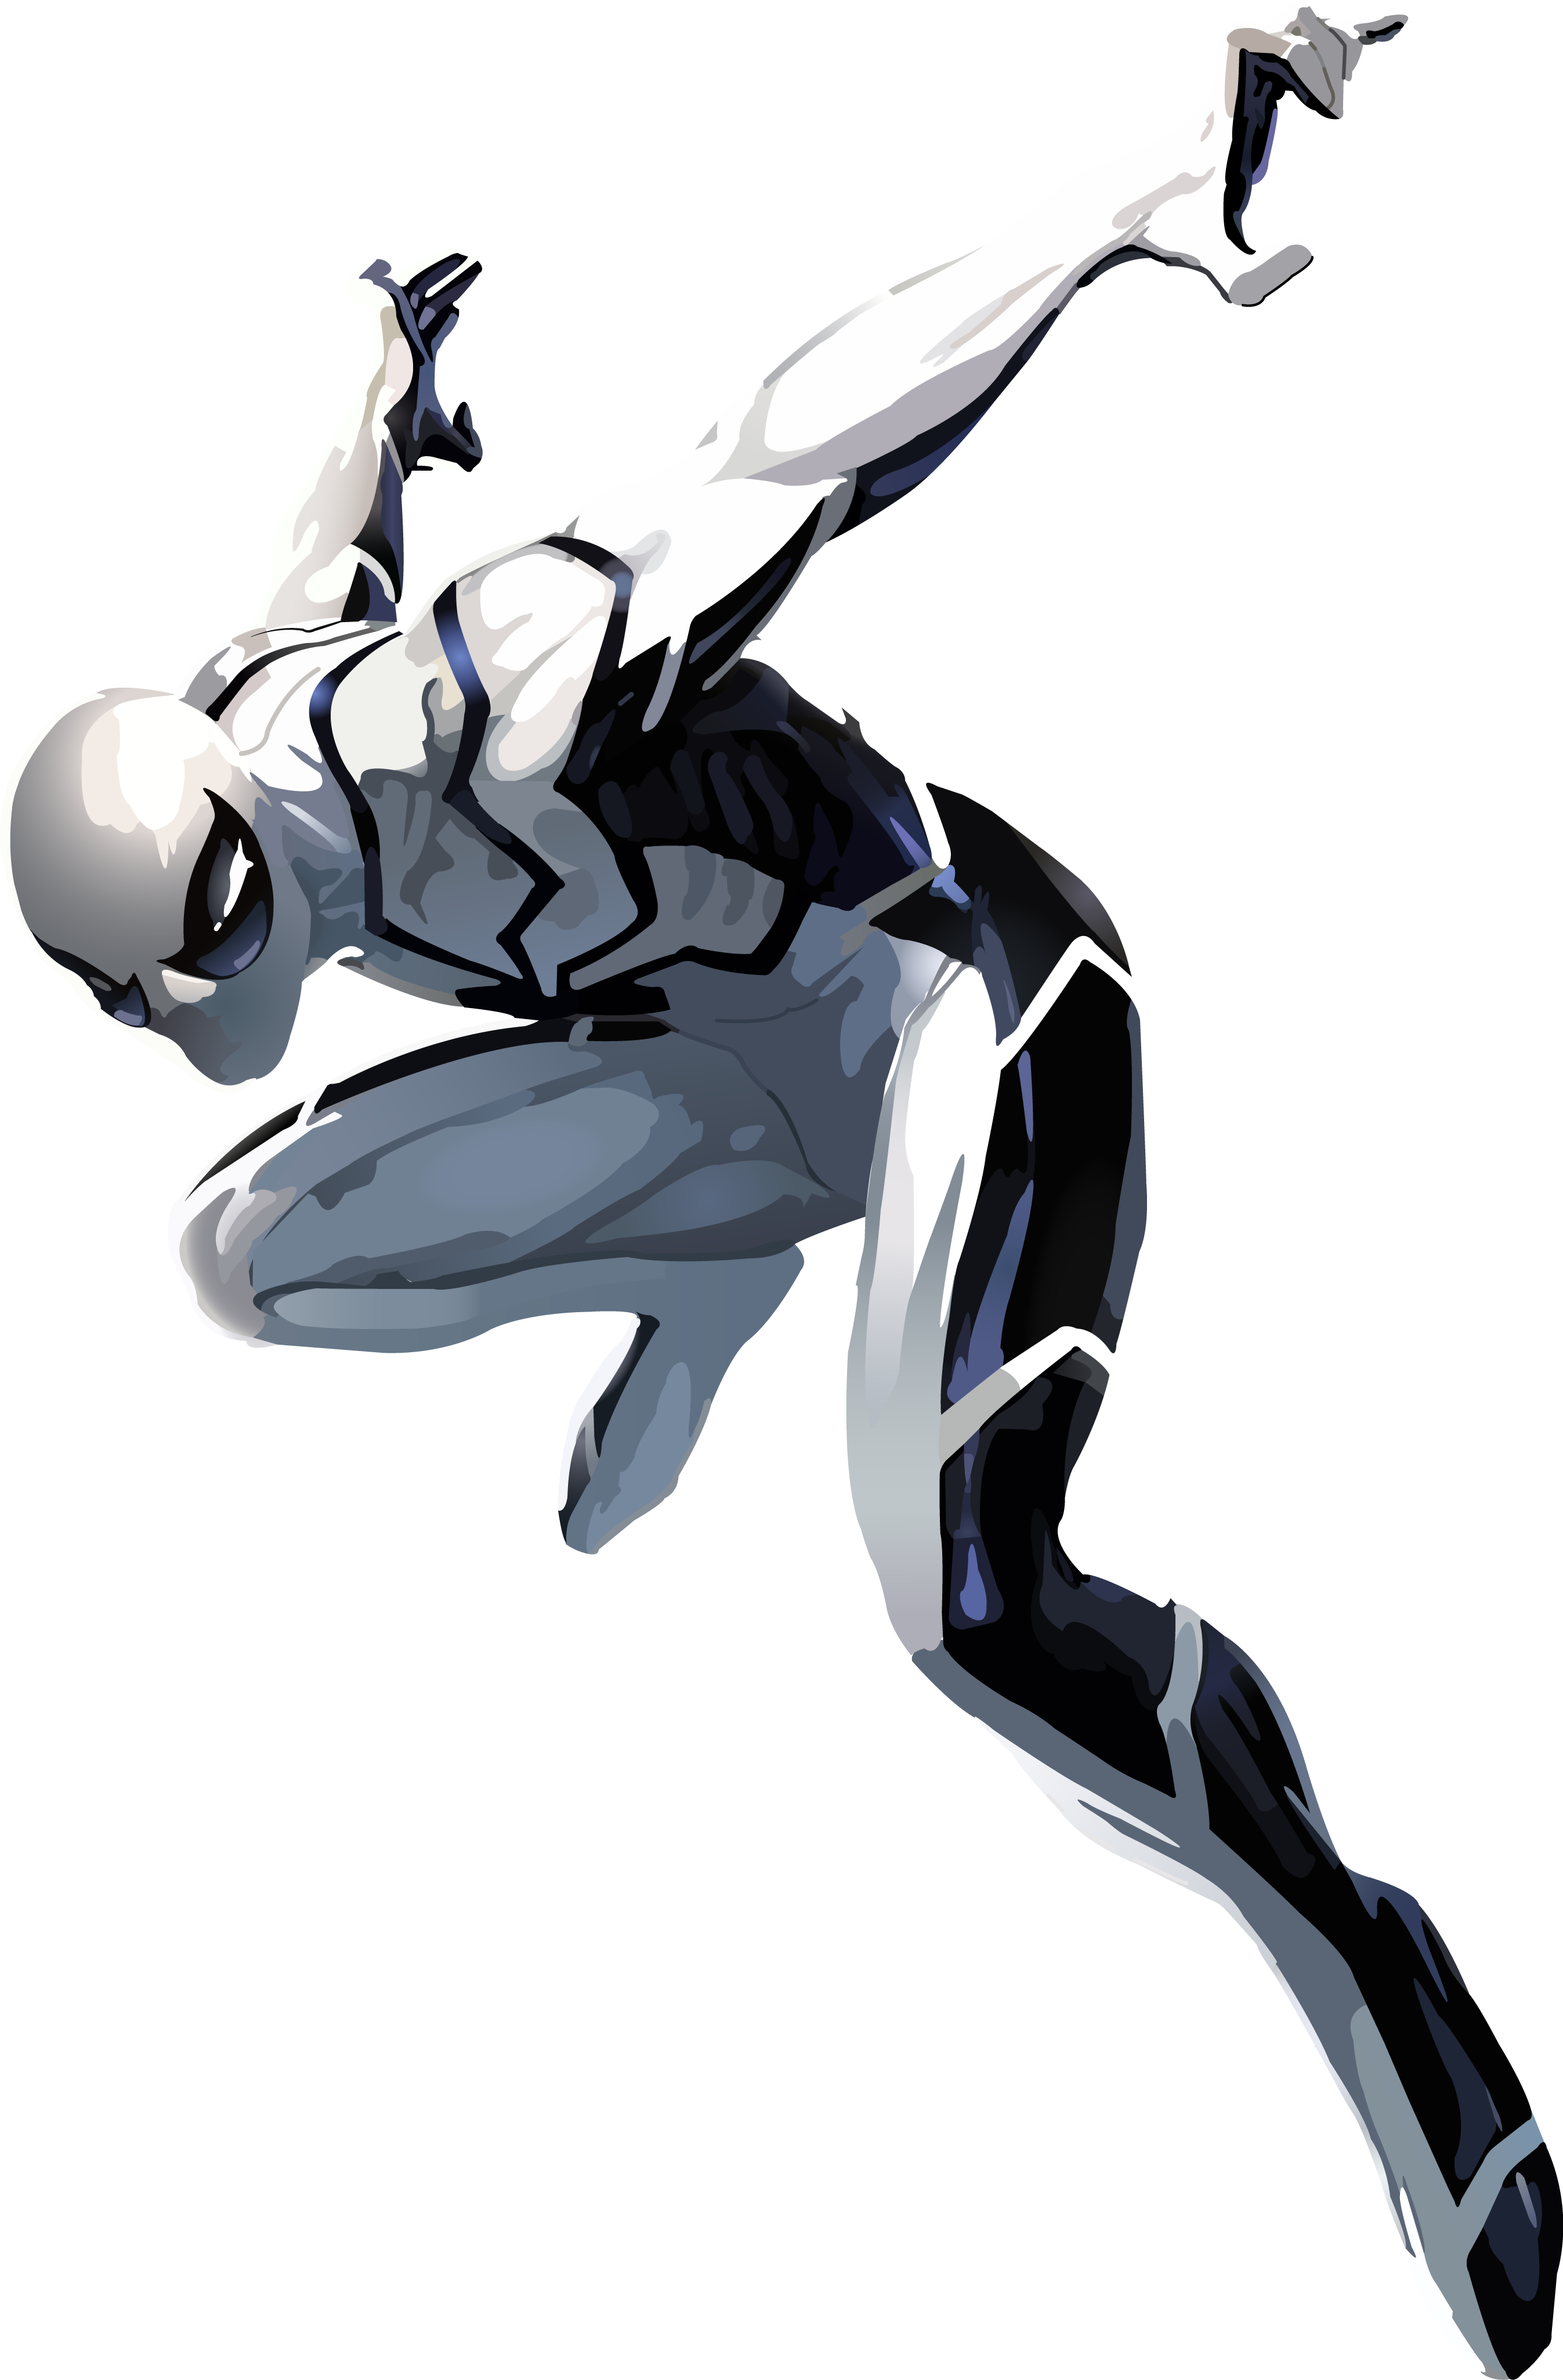 Spiderman - Future Foundation Suit | Superhero art ...